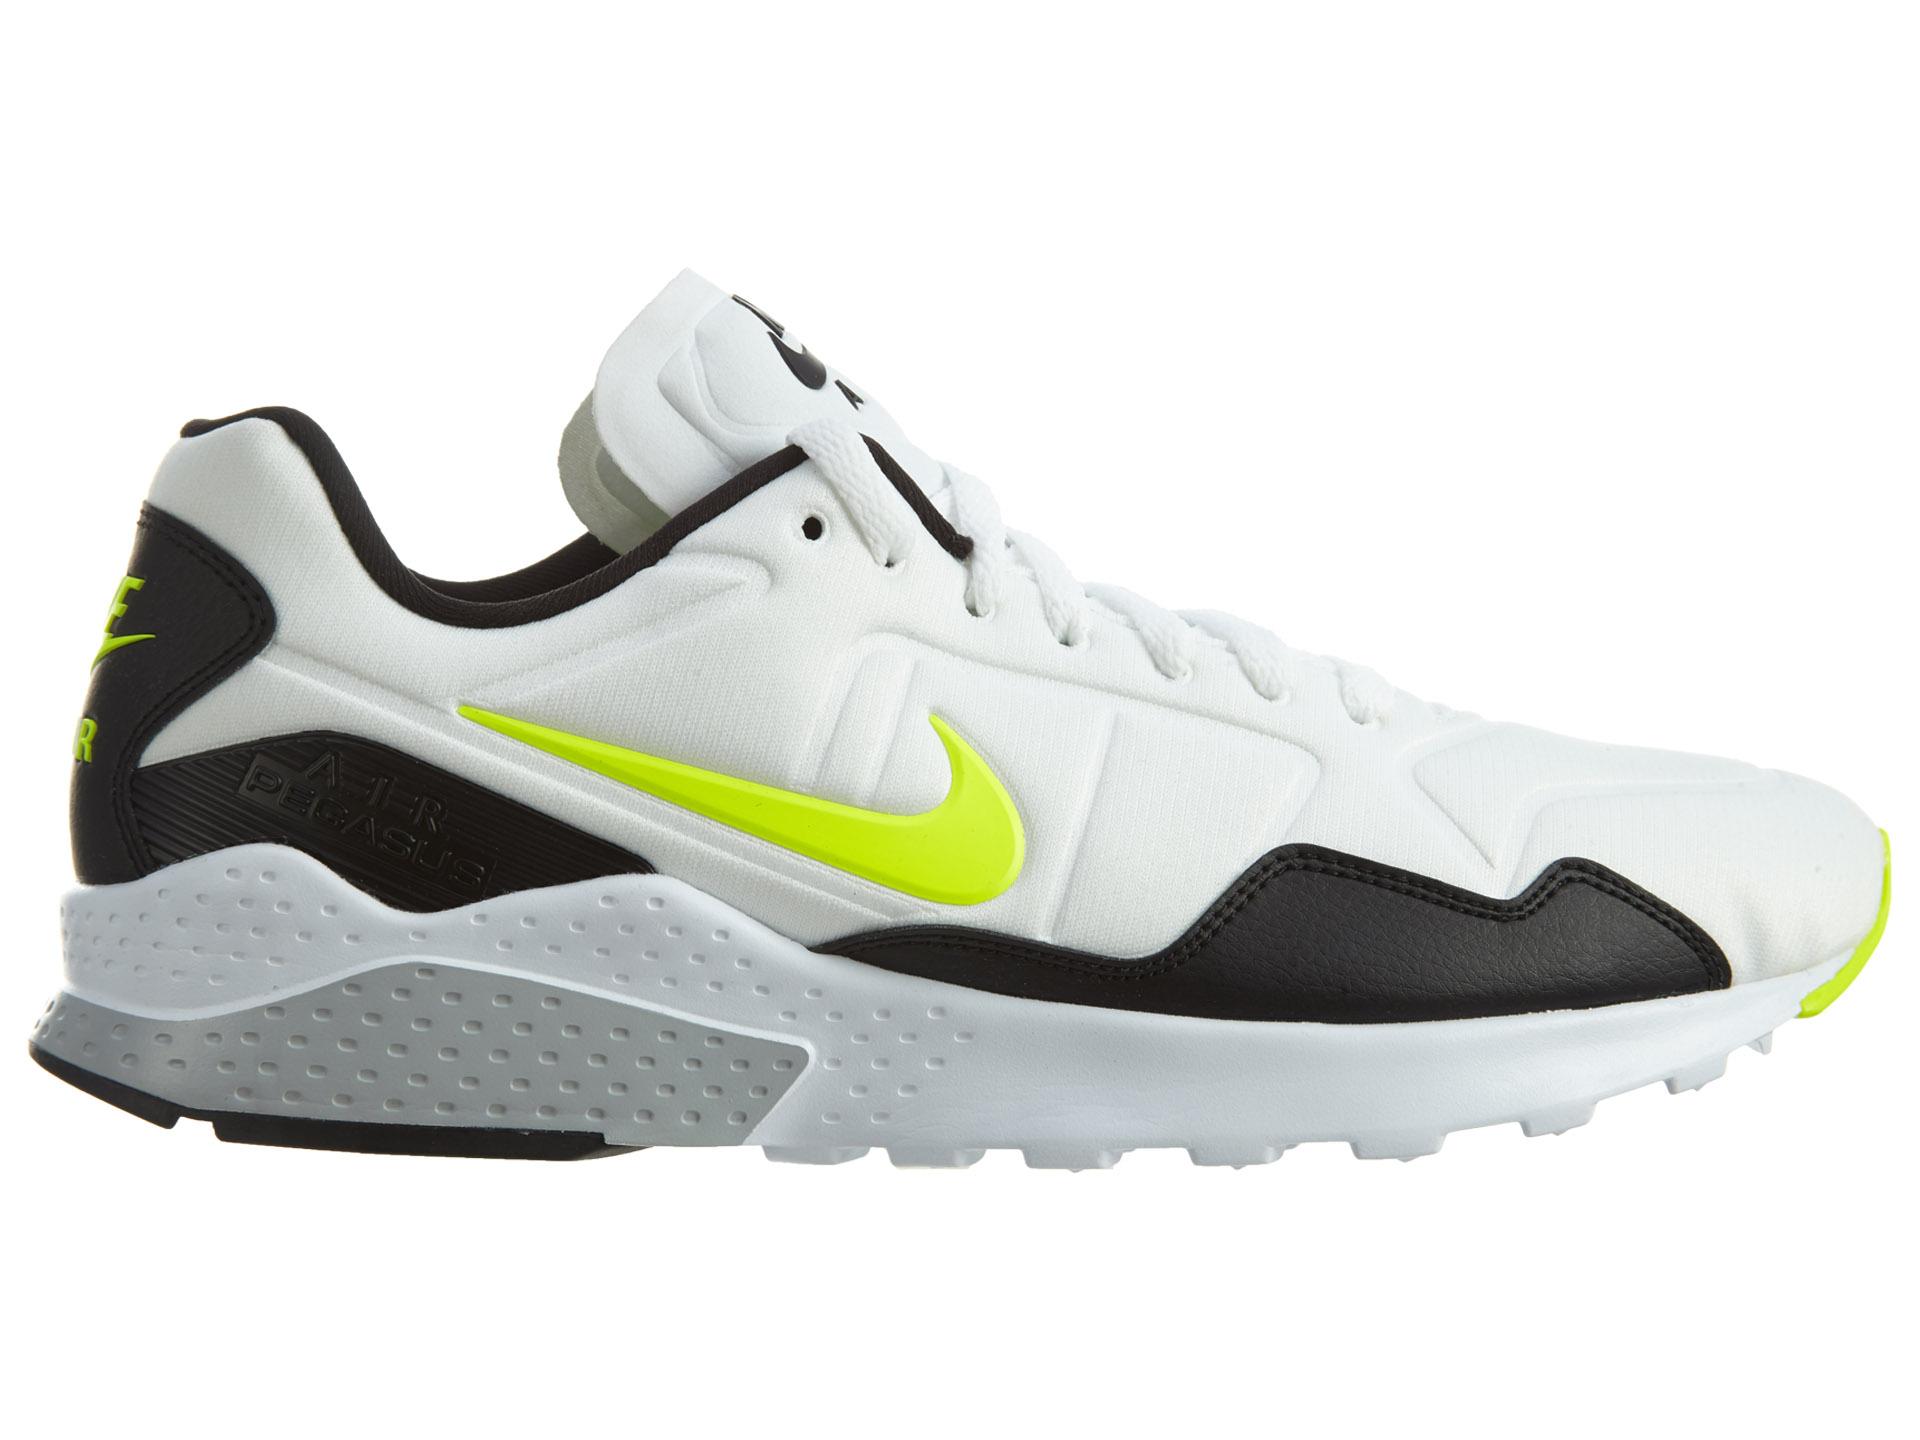 sale retailer 53d5e 9410a get purple black mens nike air pegasus 92 shoes b3f5e 96ebb